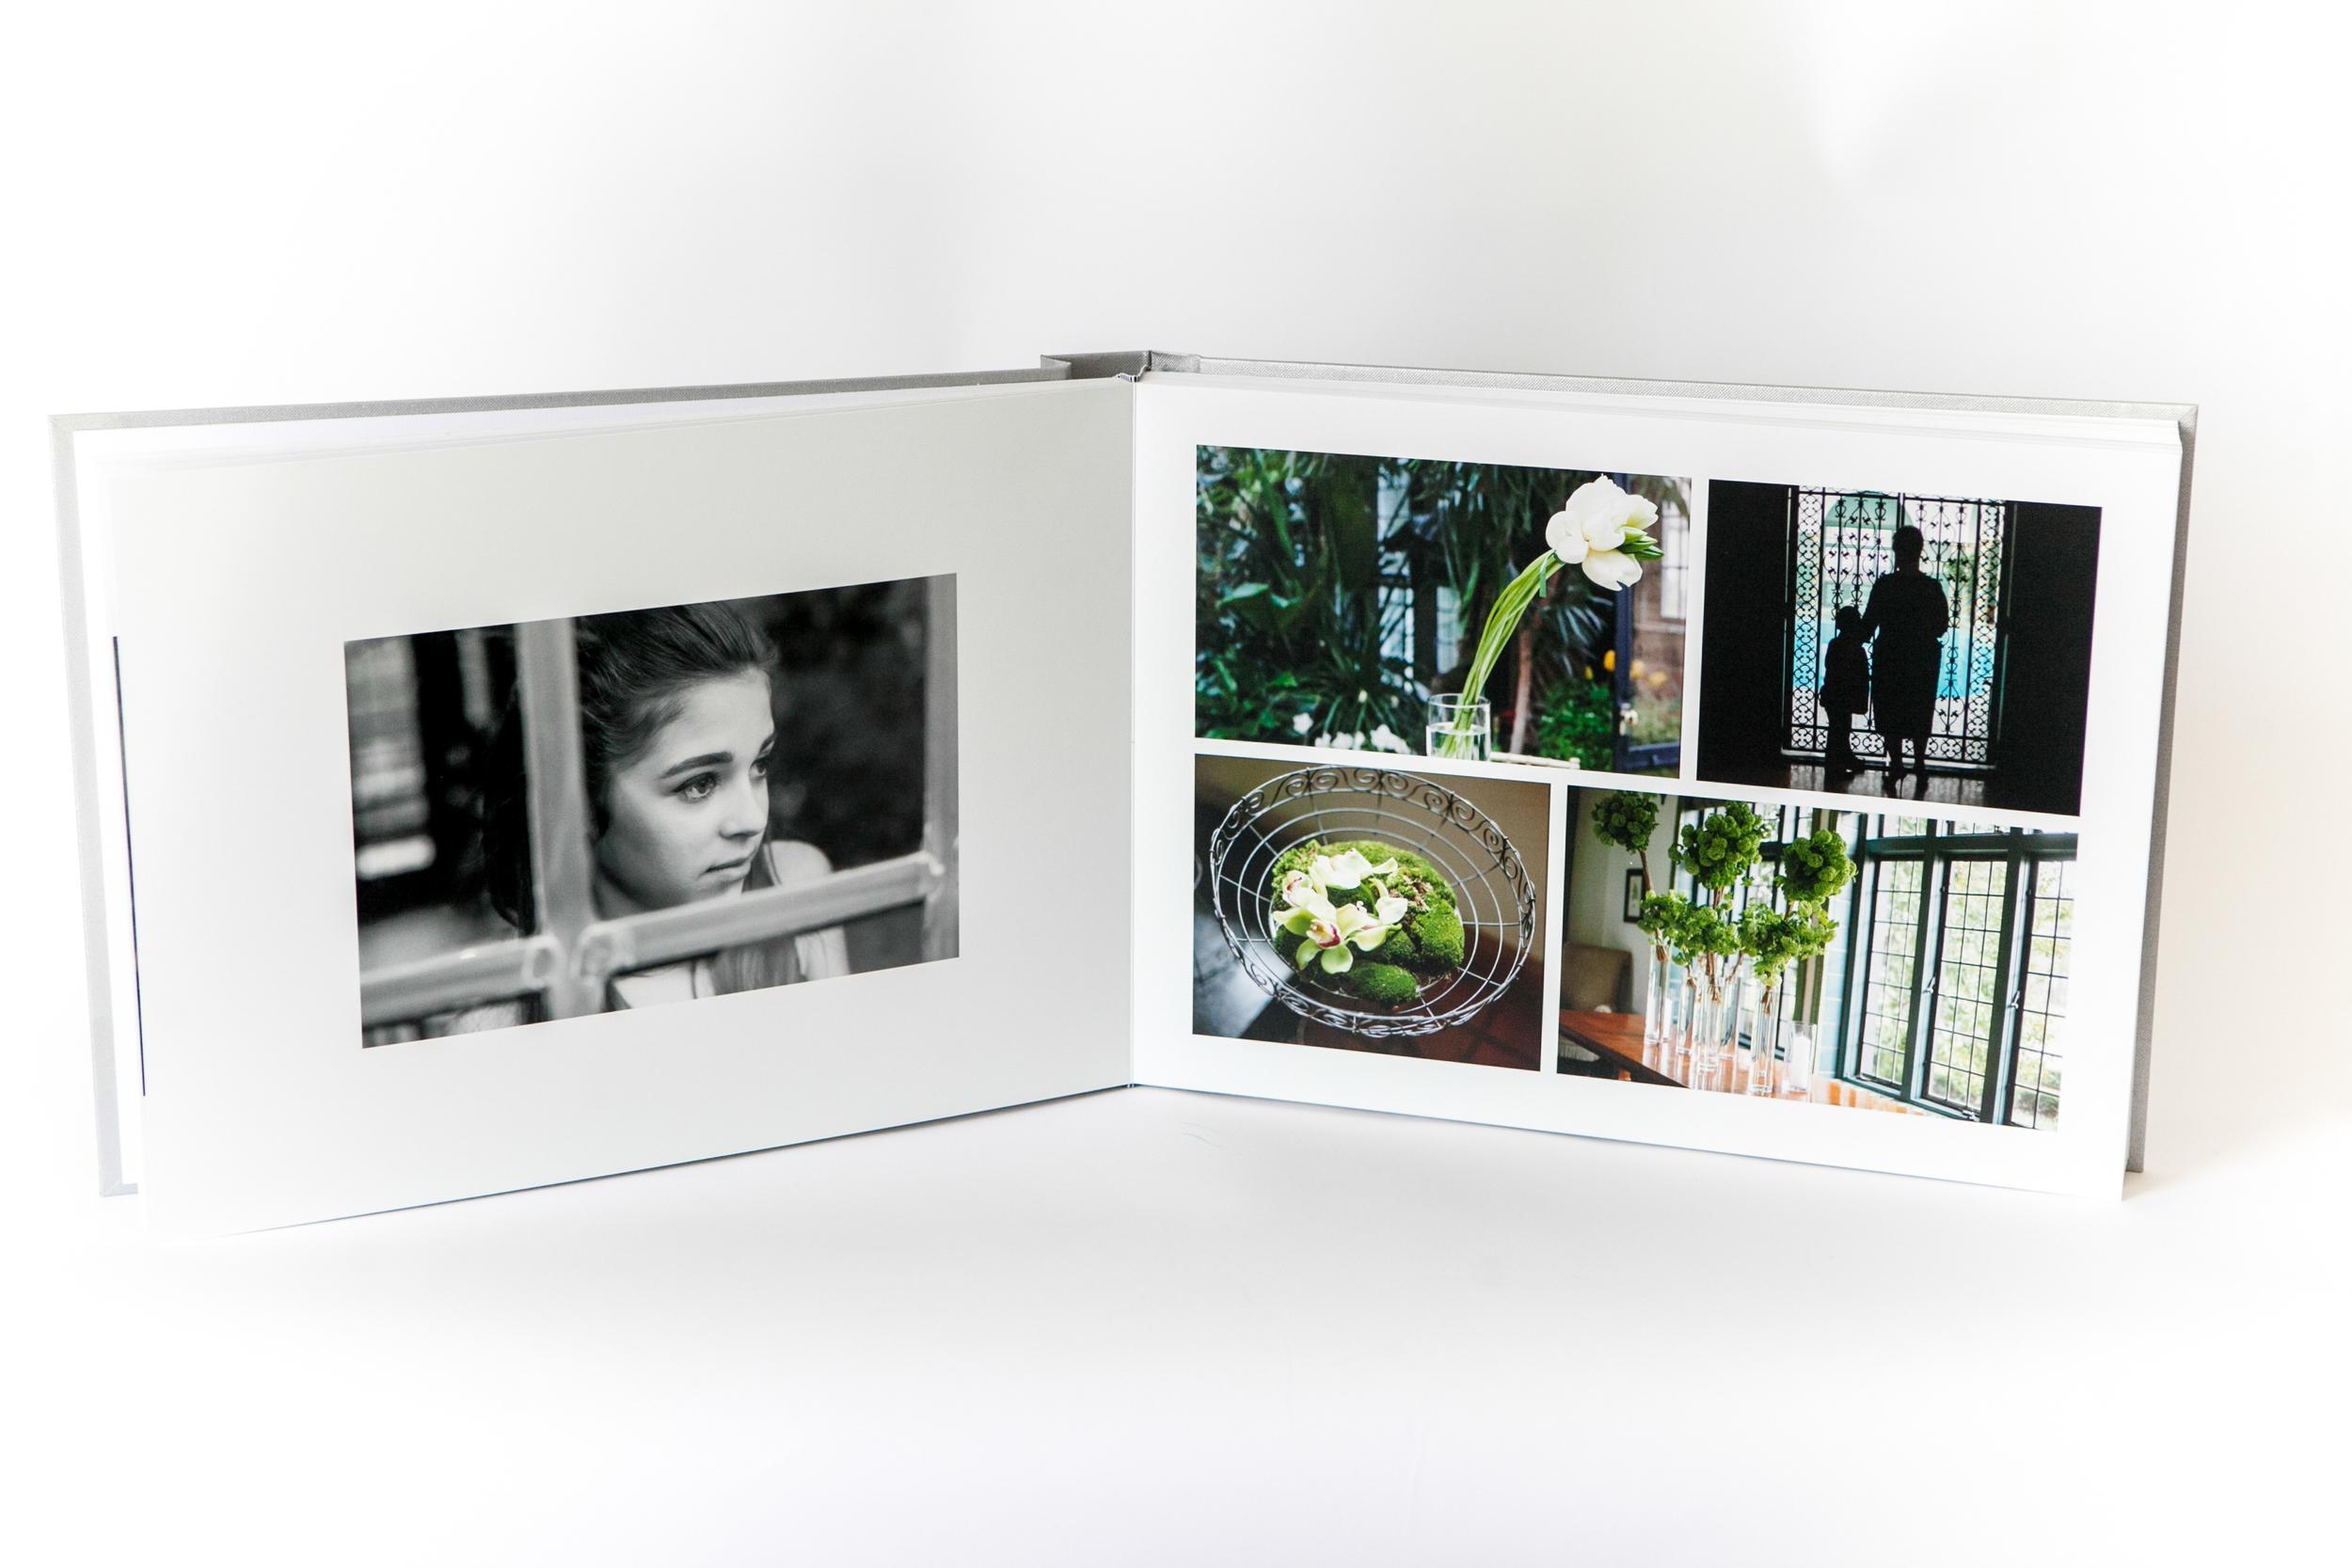 albums_march0007edit.jpg